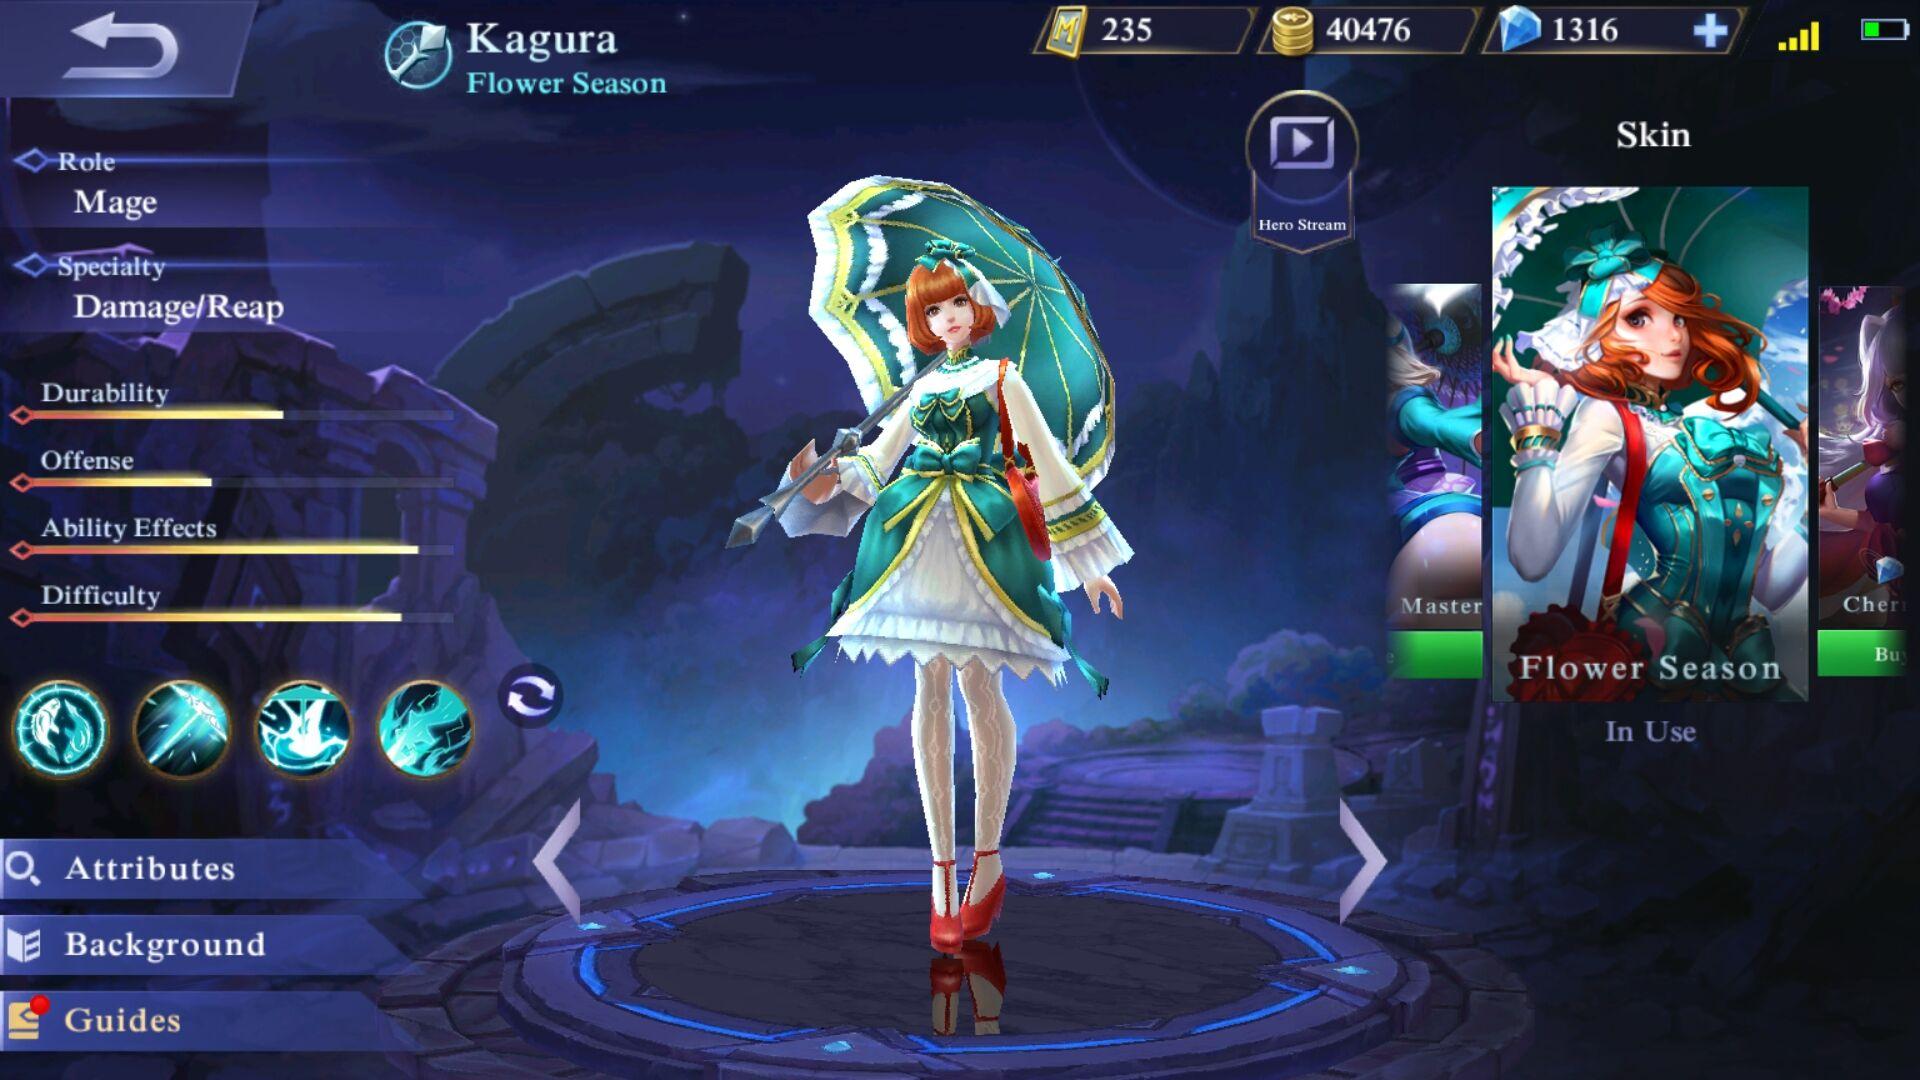 hero-cewek-mobile-legends-kagura